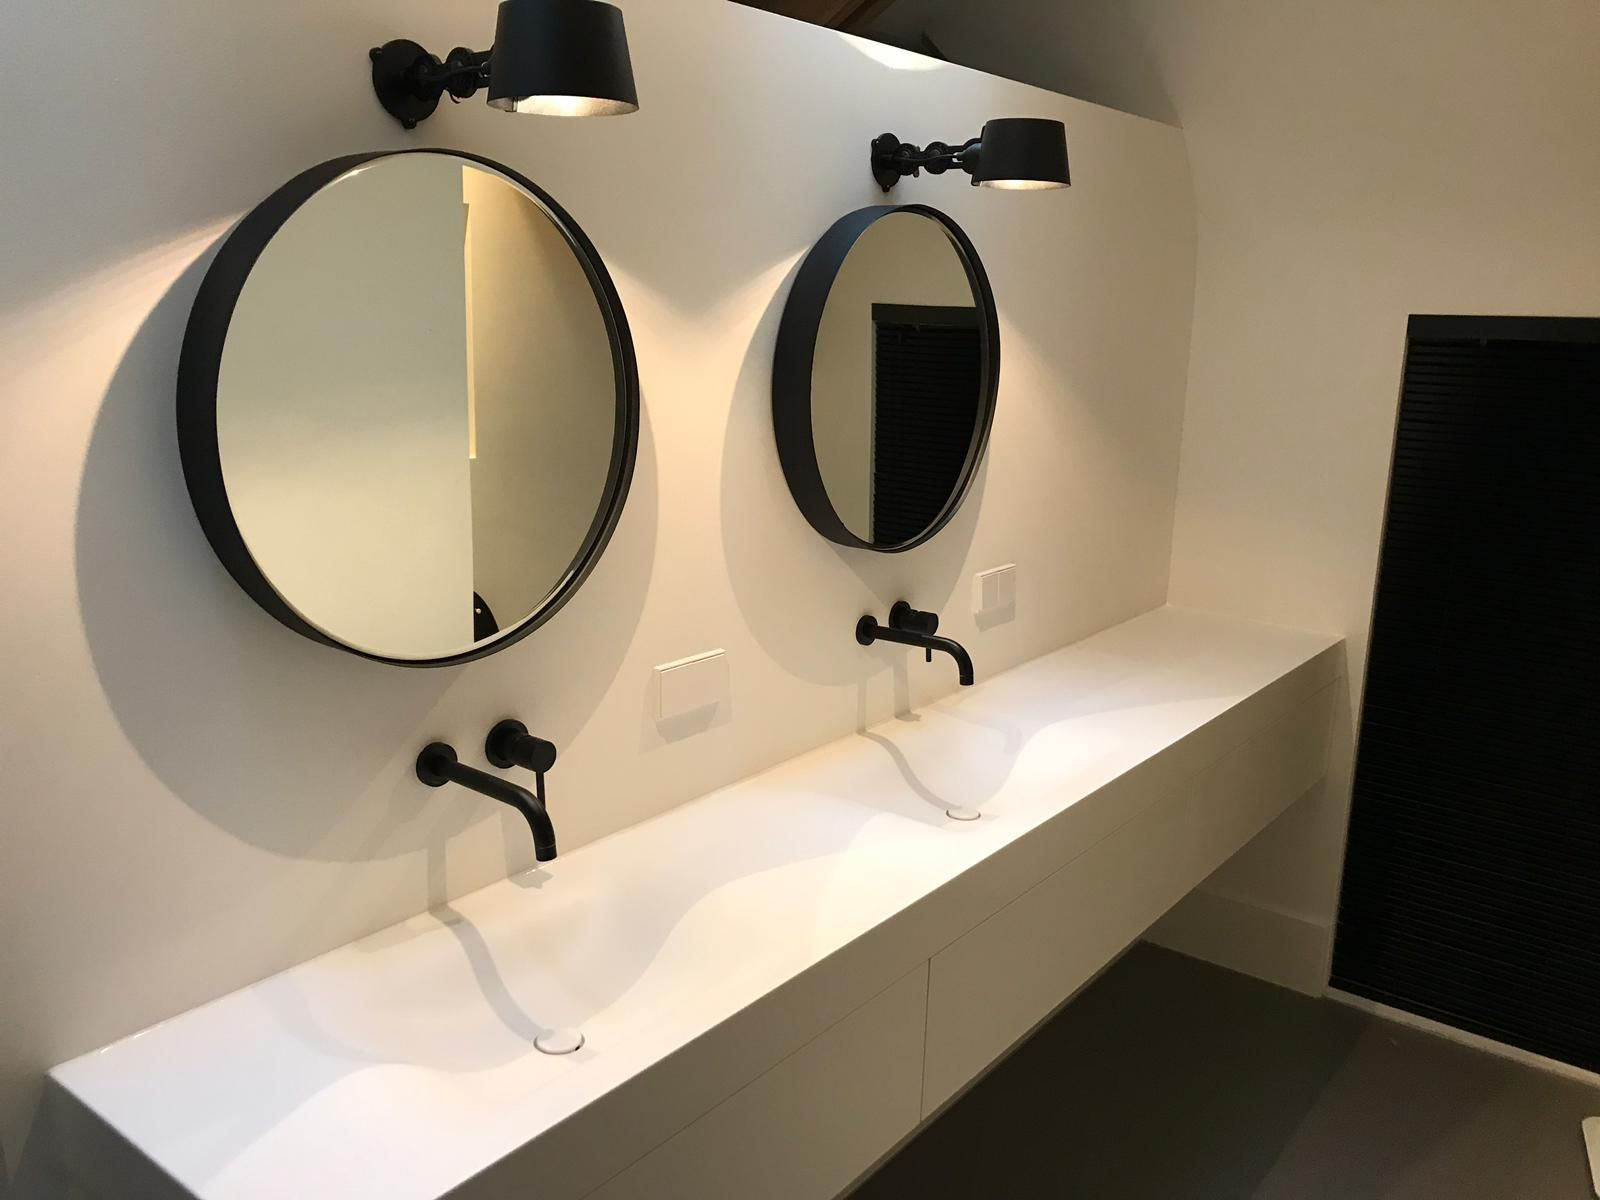 Tiz Design Kwaliteits Badkamermeubels Solid Surface Spiegel Badkamer Badkamer Badkamer Inrichting